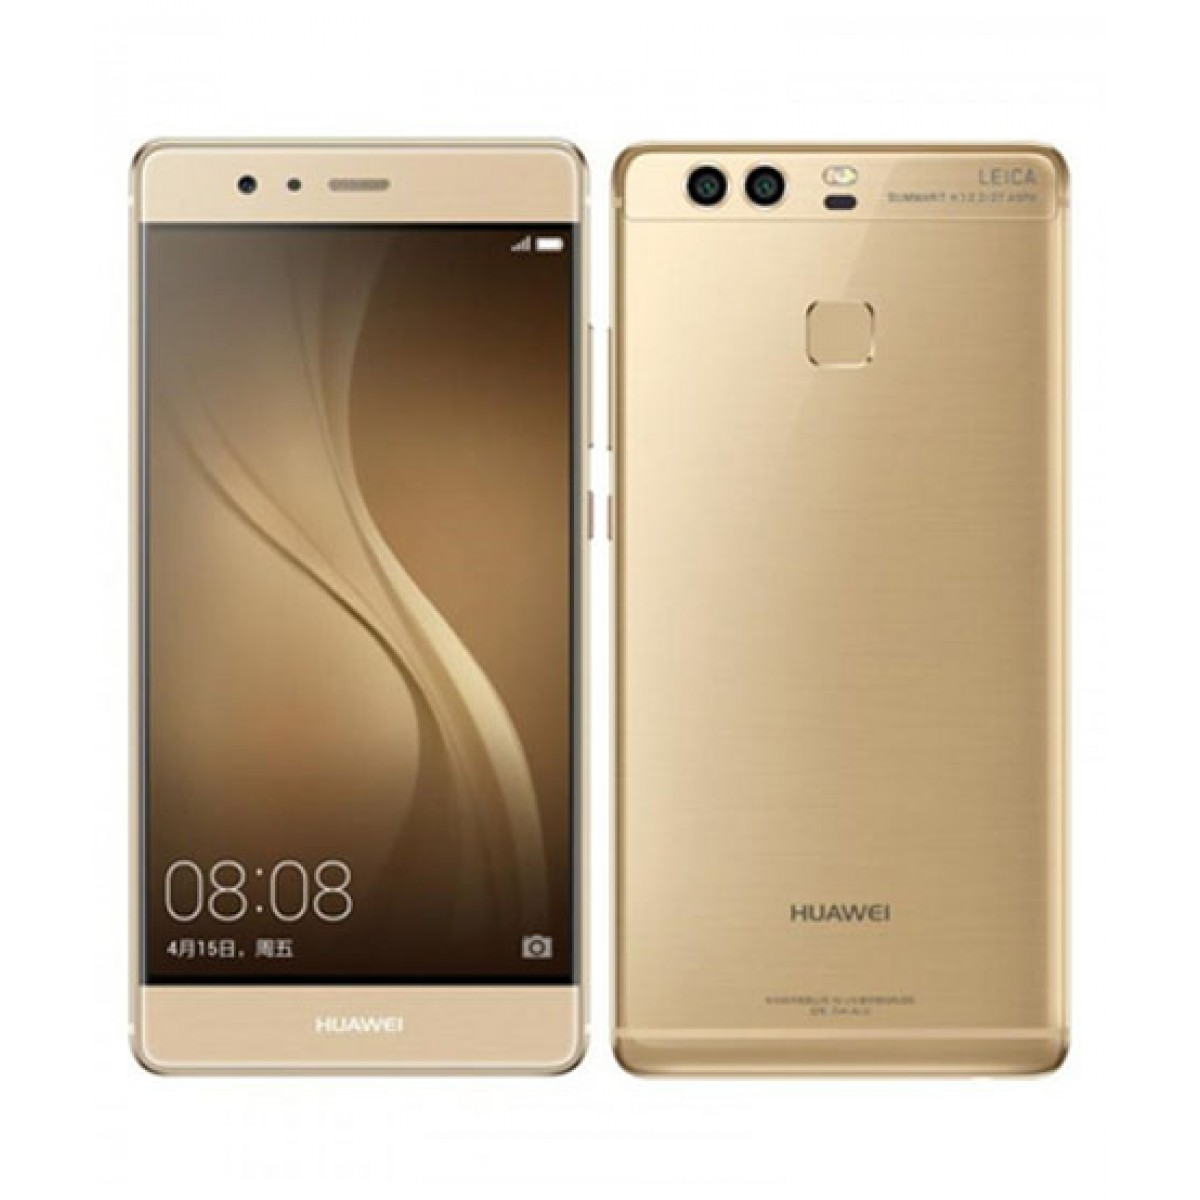 Huawei P9 Plus 64GB 4G Dual Sim Haze Gold (VIE-L29)